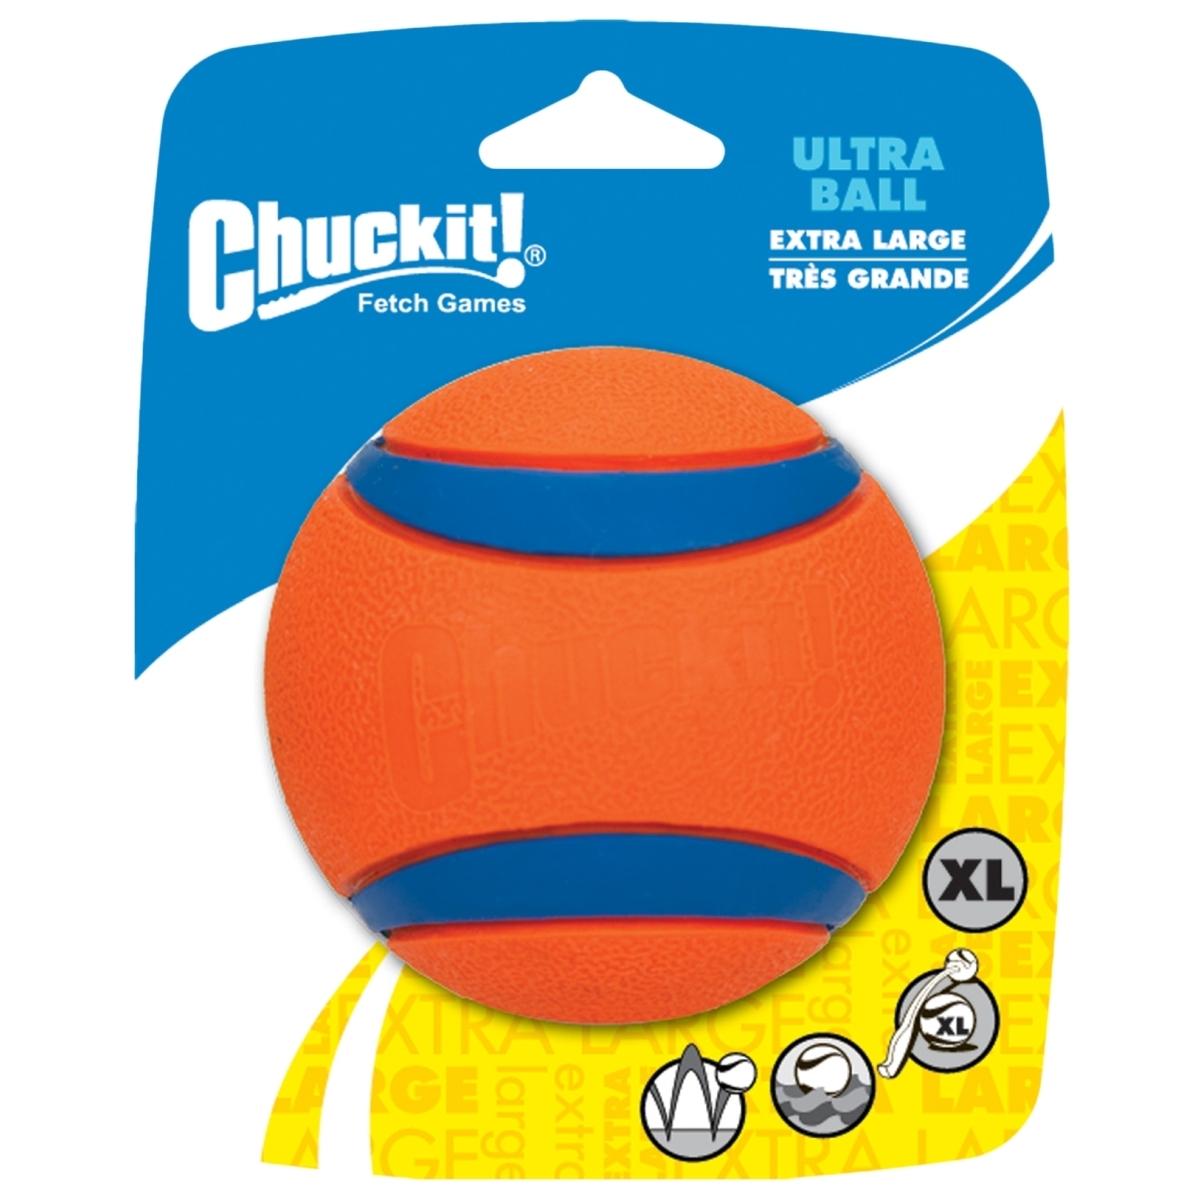 CI ULTRA BALL XL 1-PACK 00001